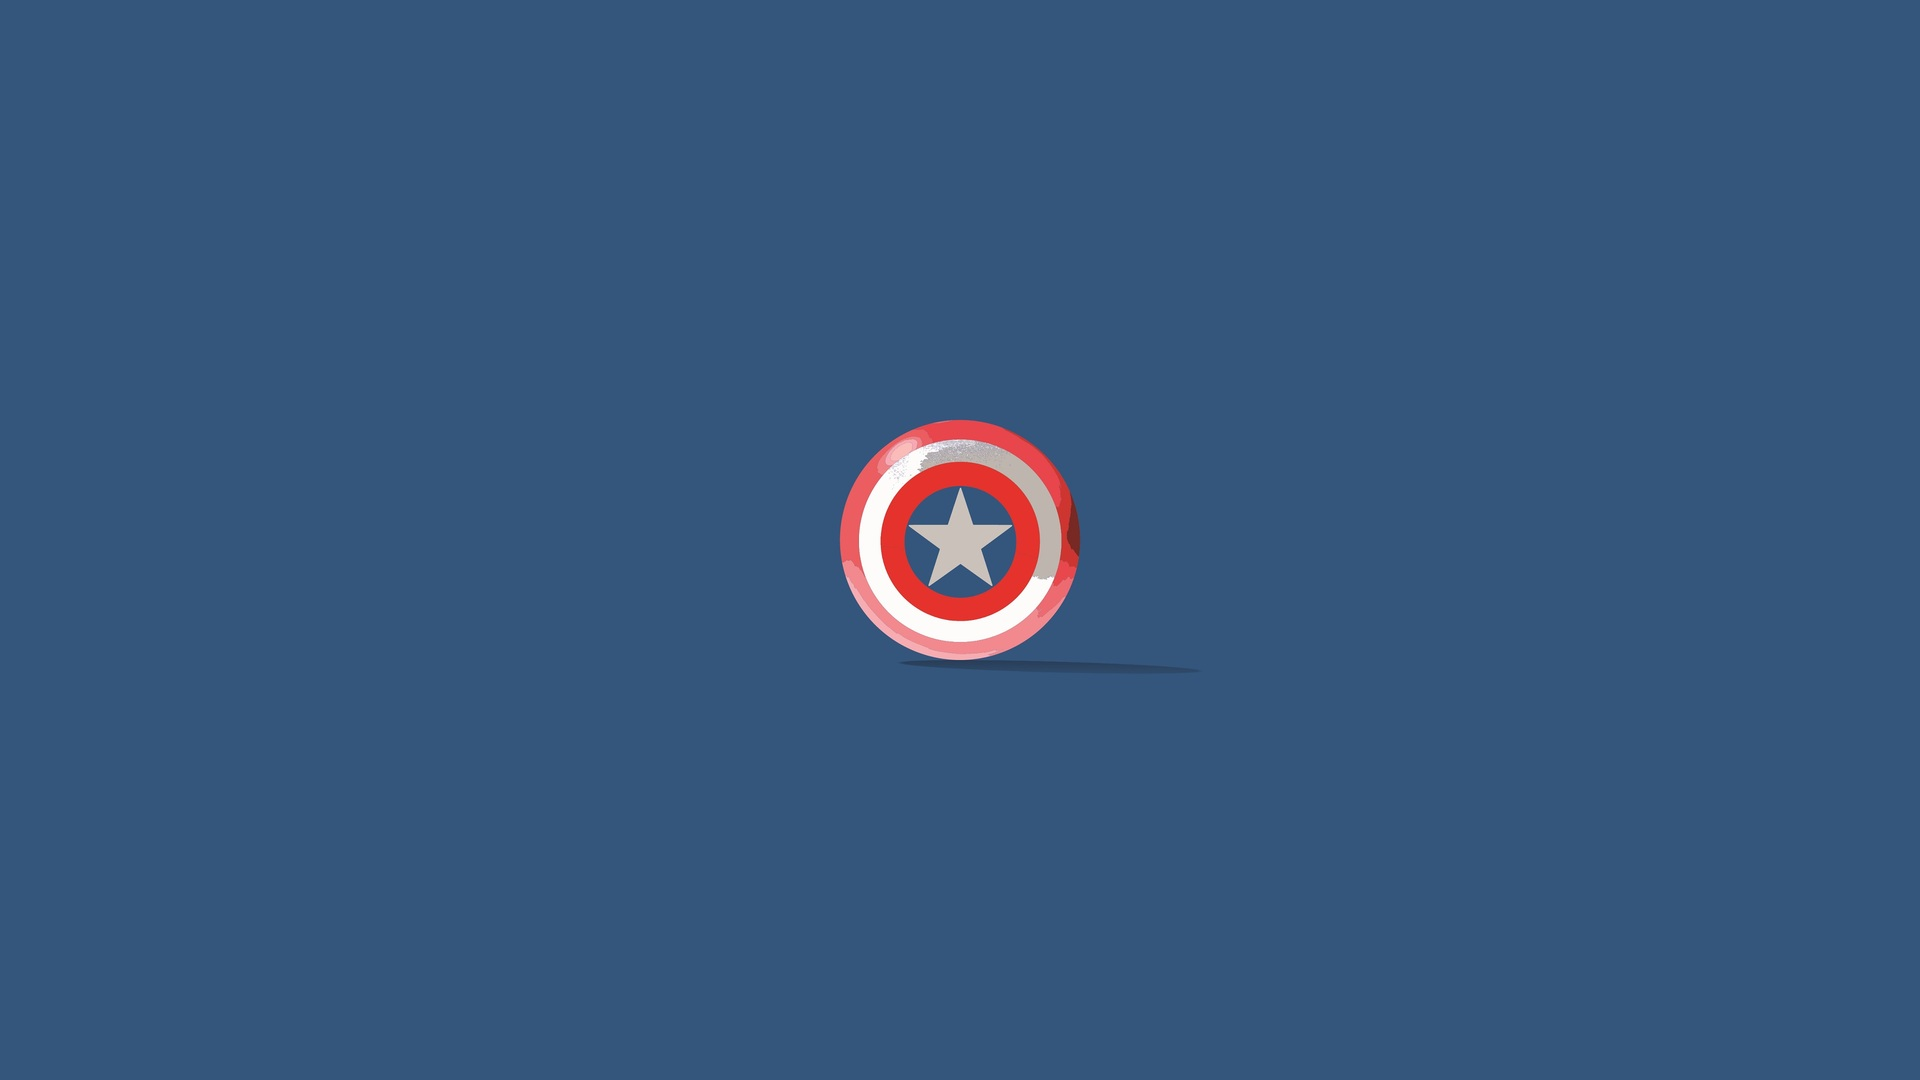 1920x1080 captain america shield minimalism laptop full hd